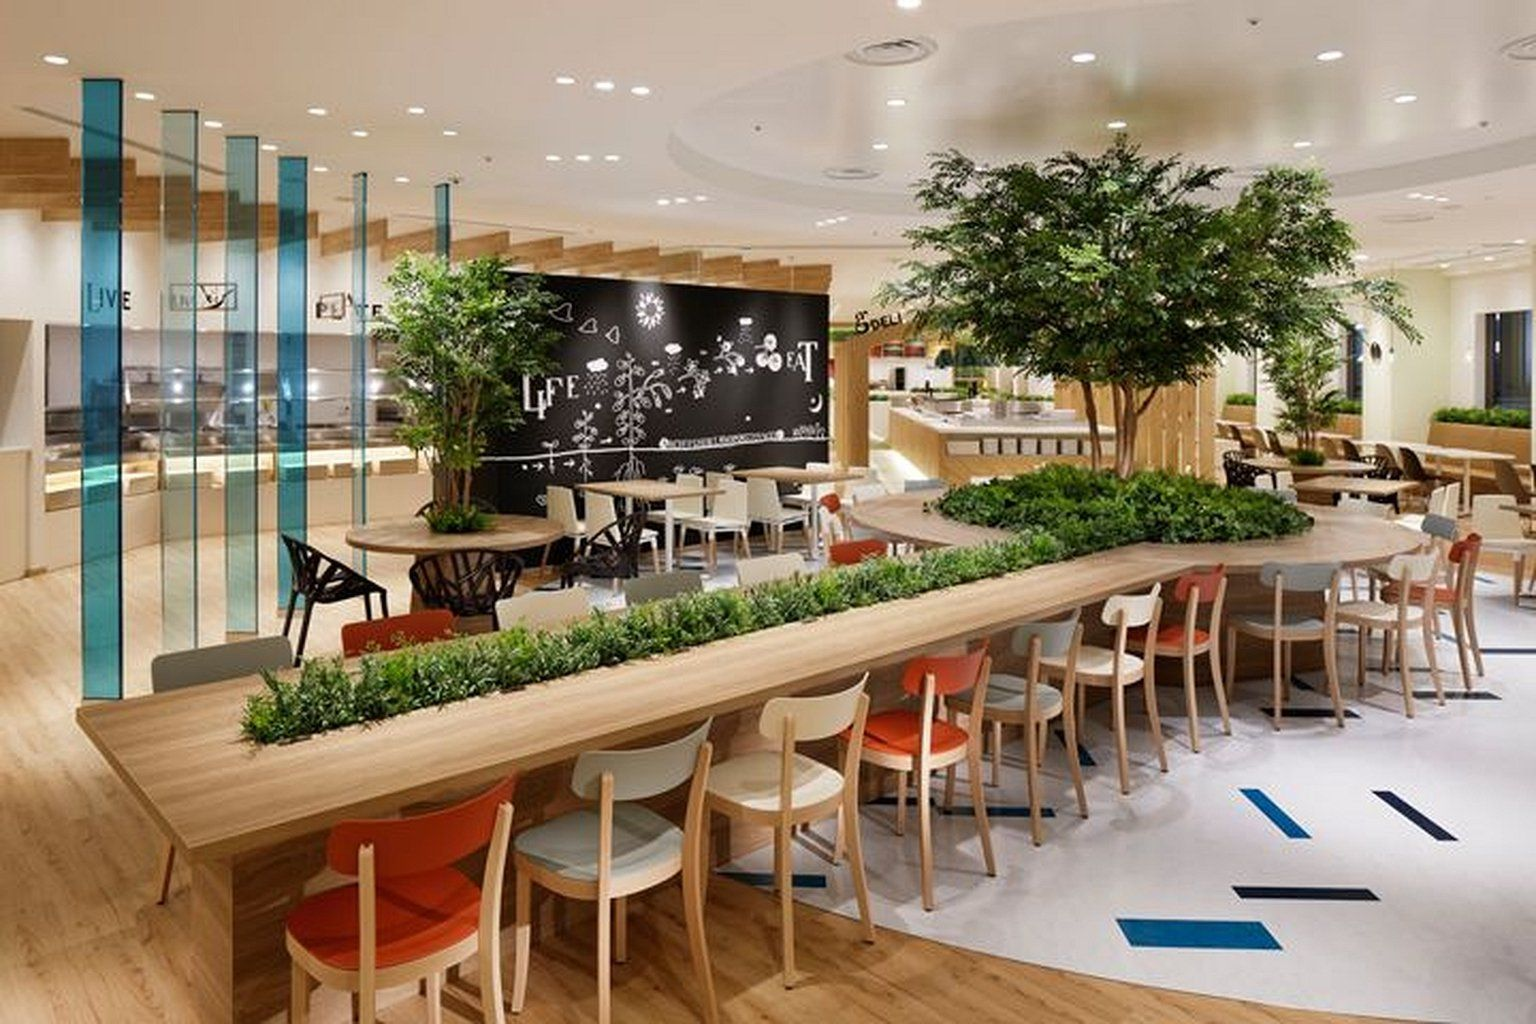 Cafe Interior Ideas Creative 3 With Images Cafe Bar Design